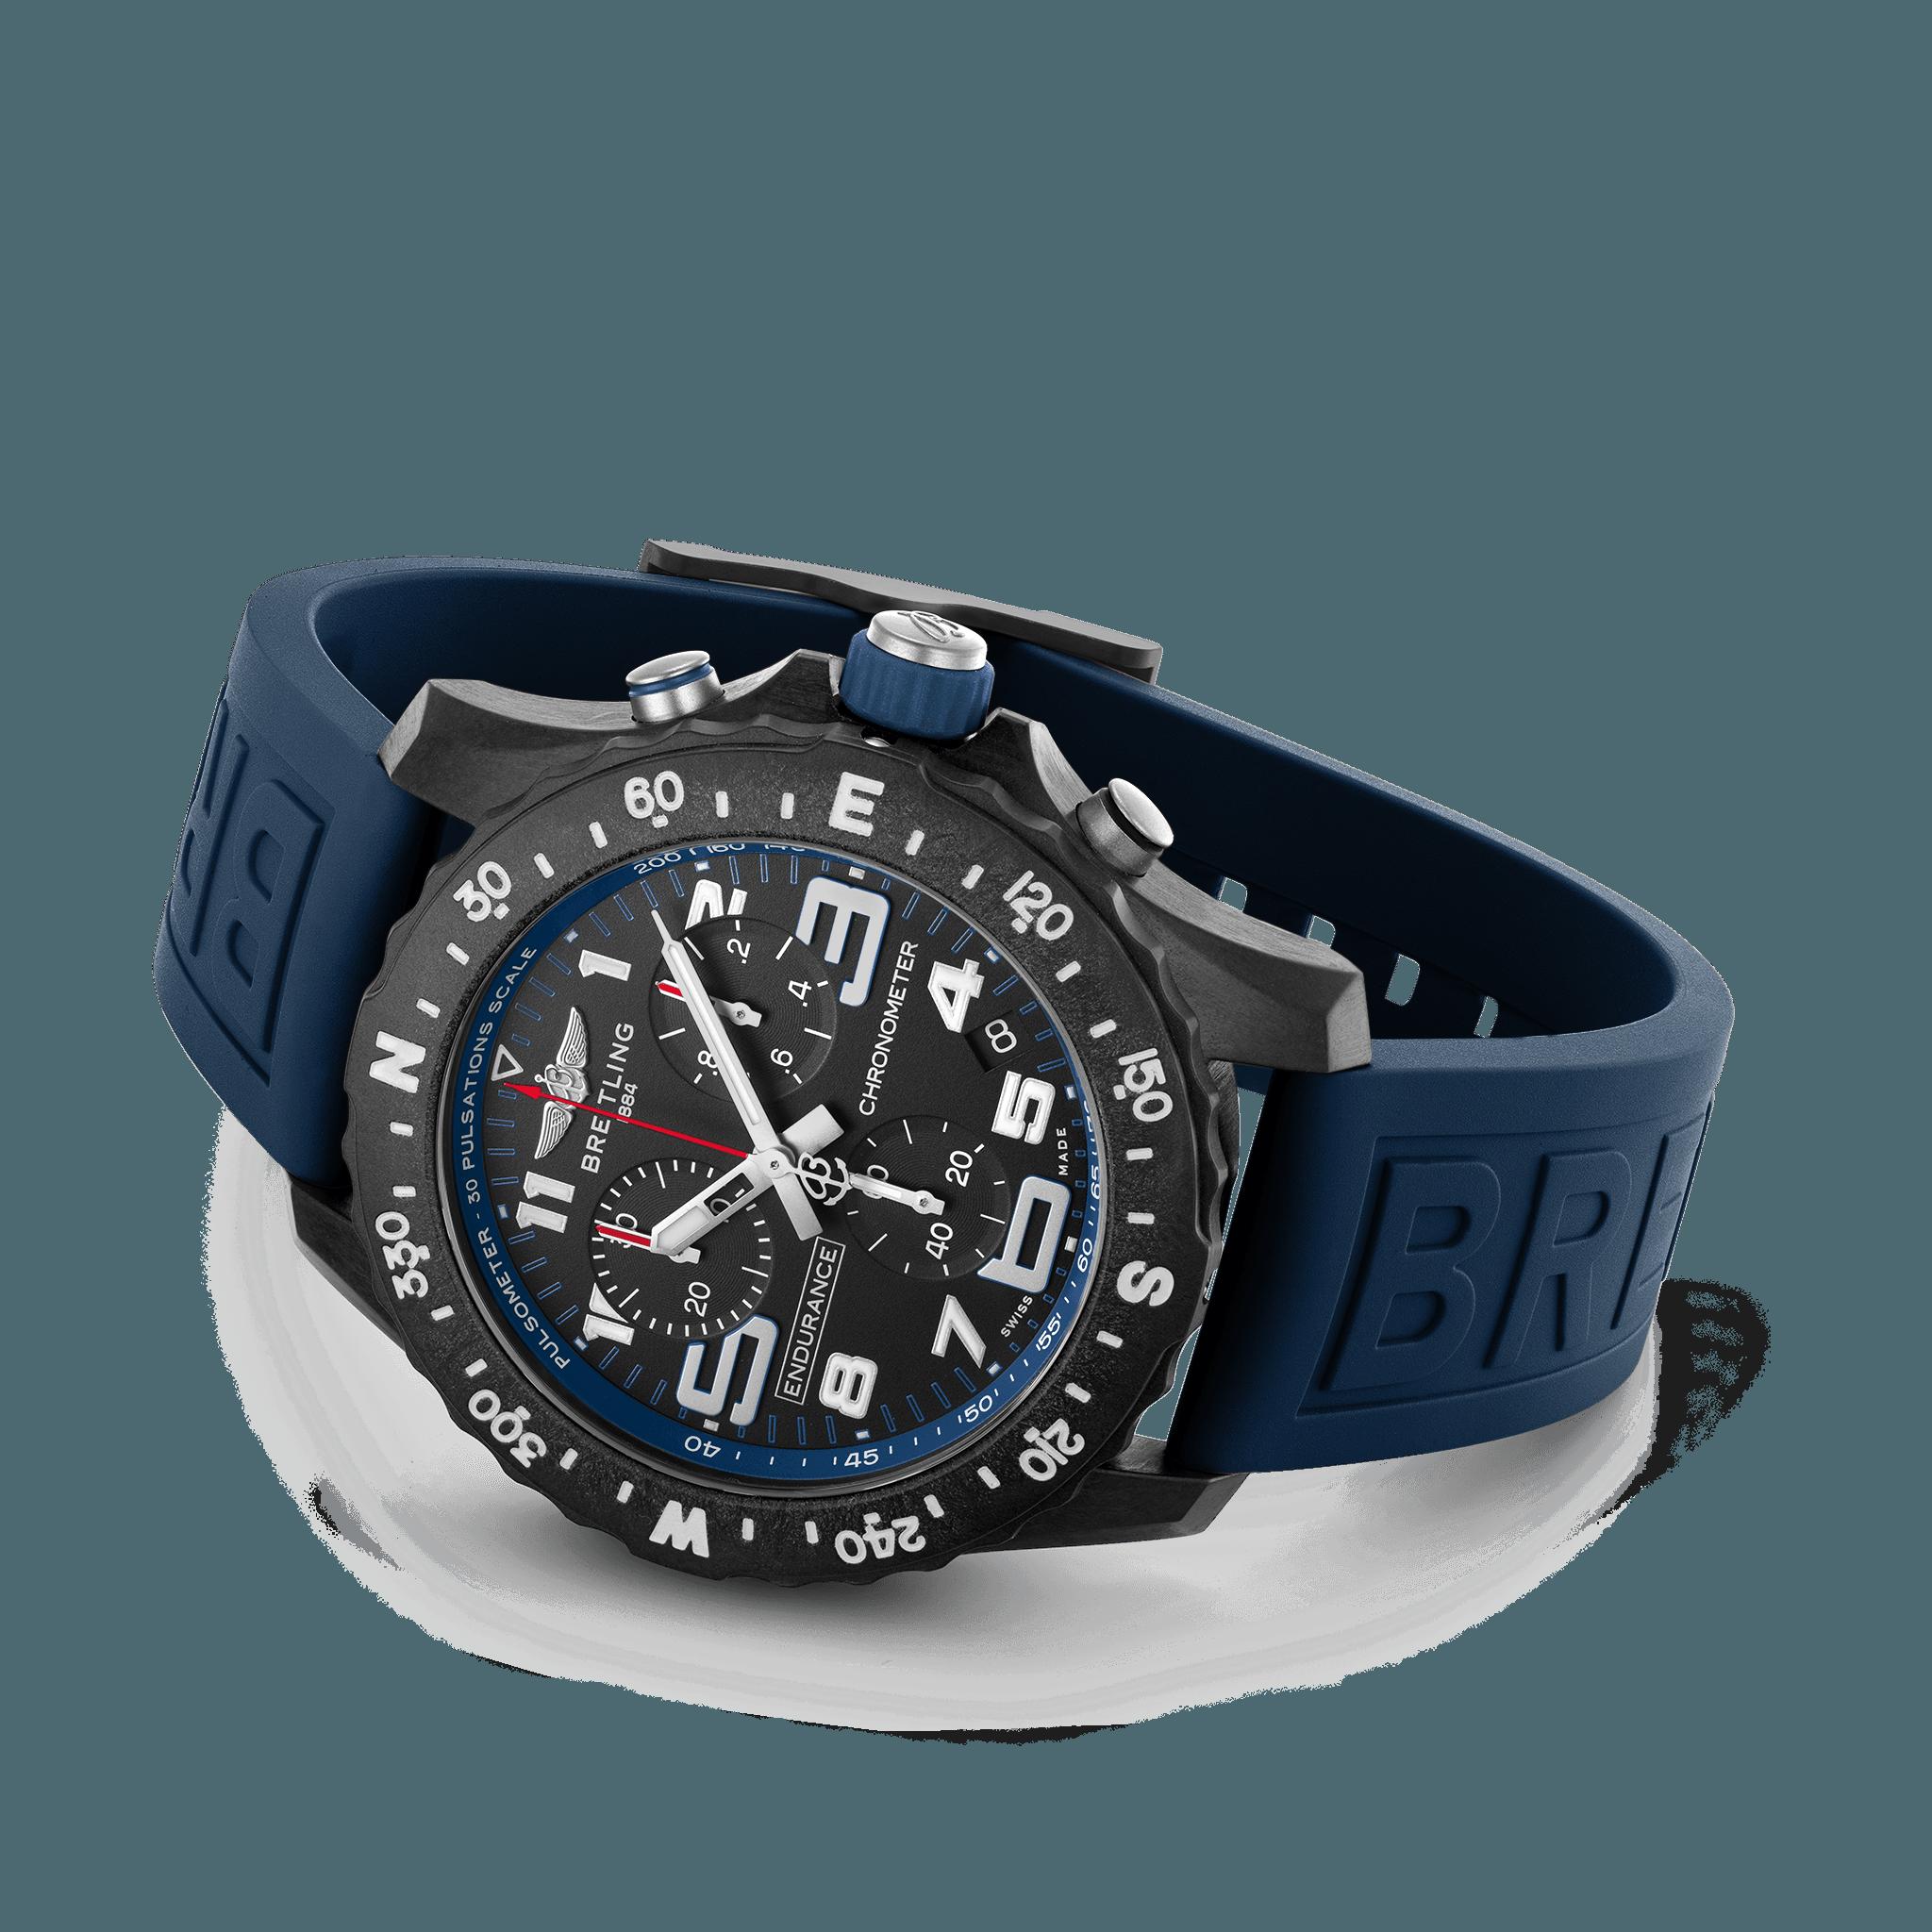 Breitling Endurance Pro Ref. x82310d51b1s1